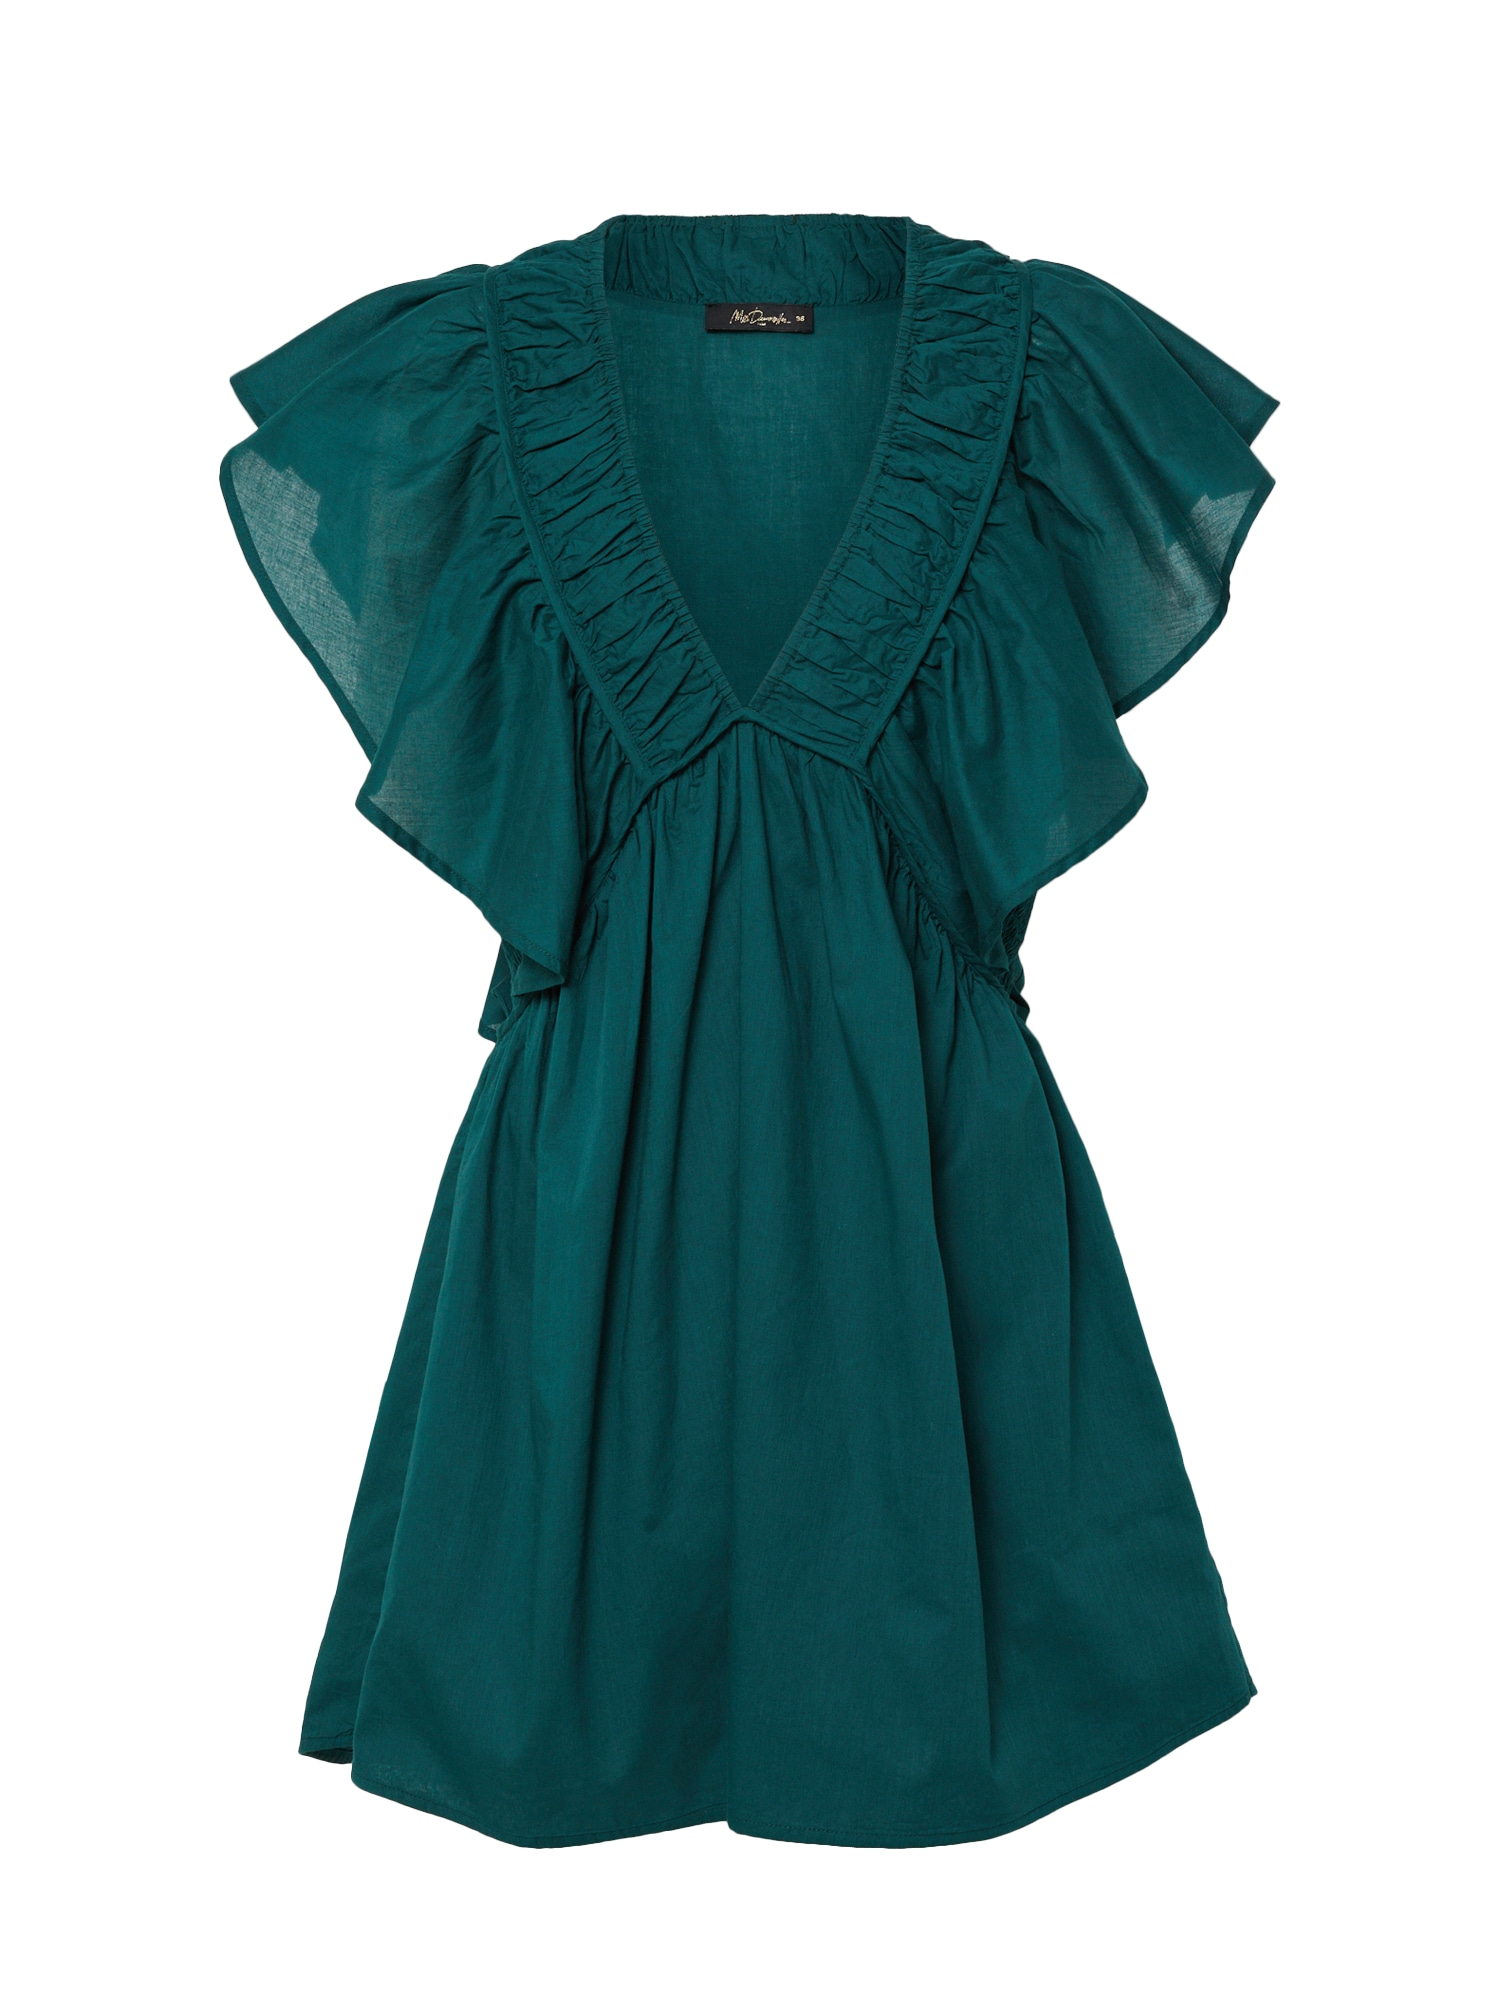 Mes Demoiselles Tunika 'Calixte' smaragdinė spalva